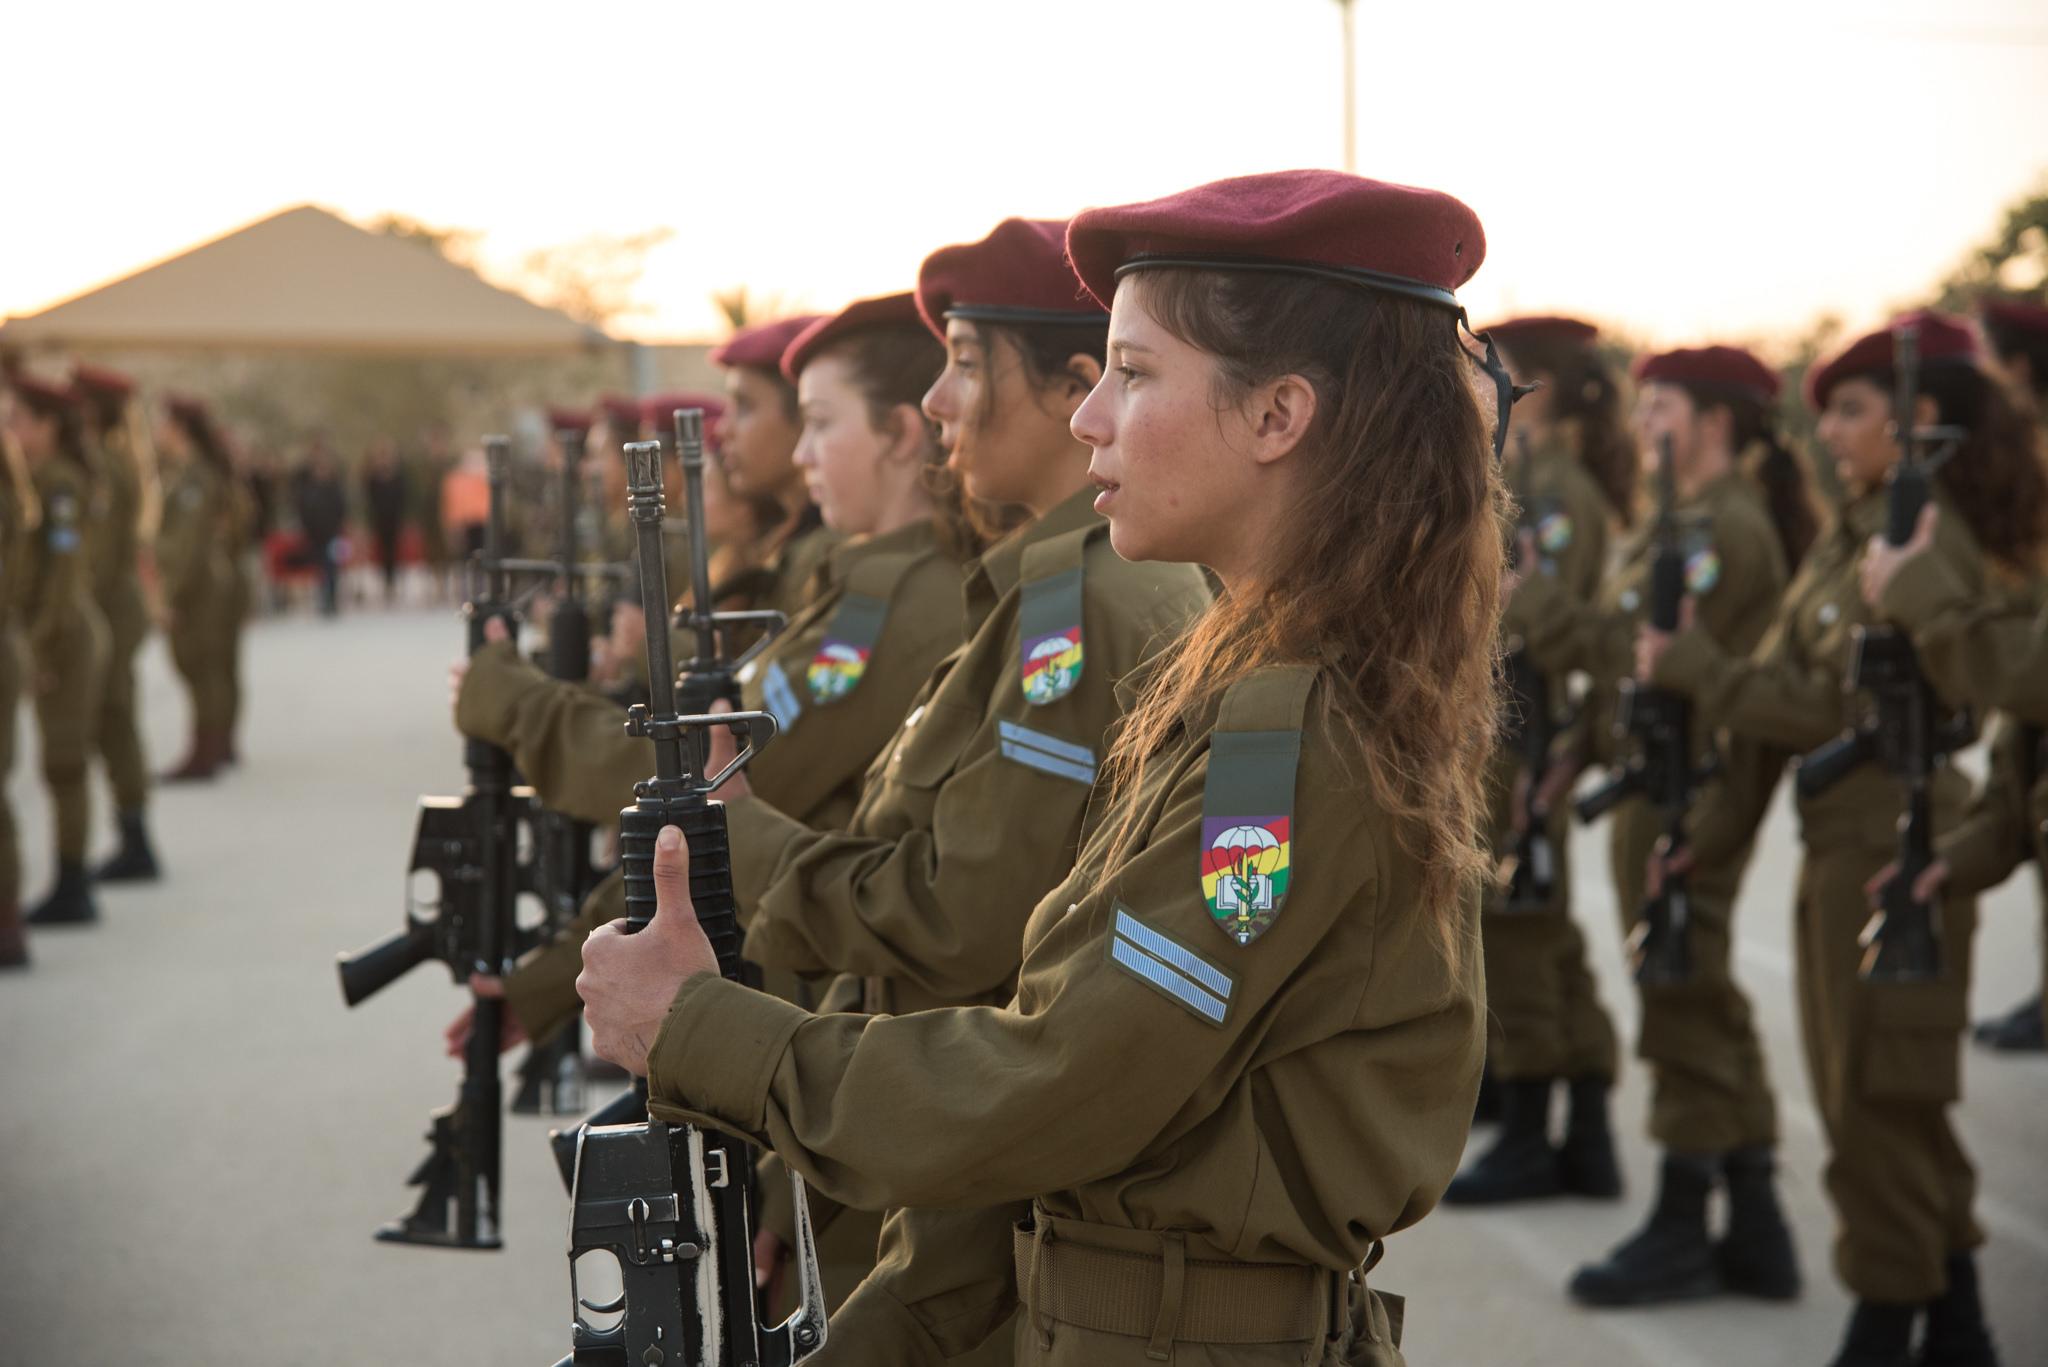 Женская армия. ( 55 фото ) 39728536682_70a0fefb3c_k.jpg